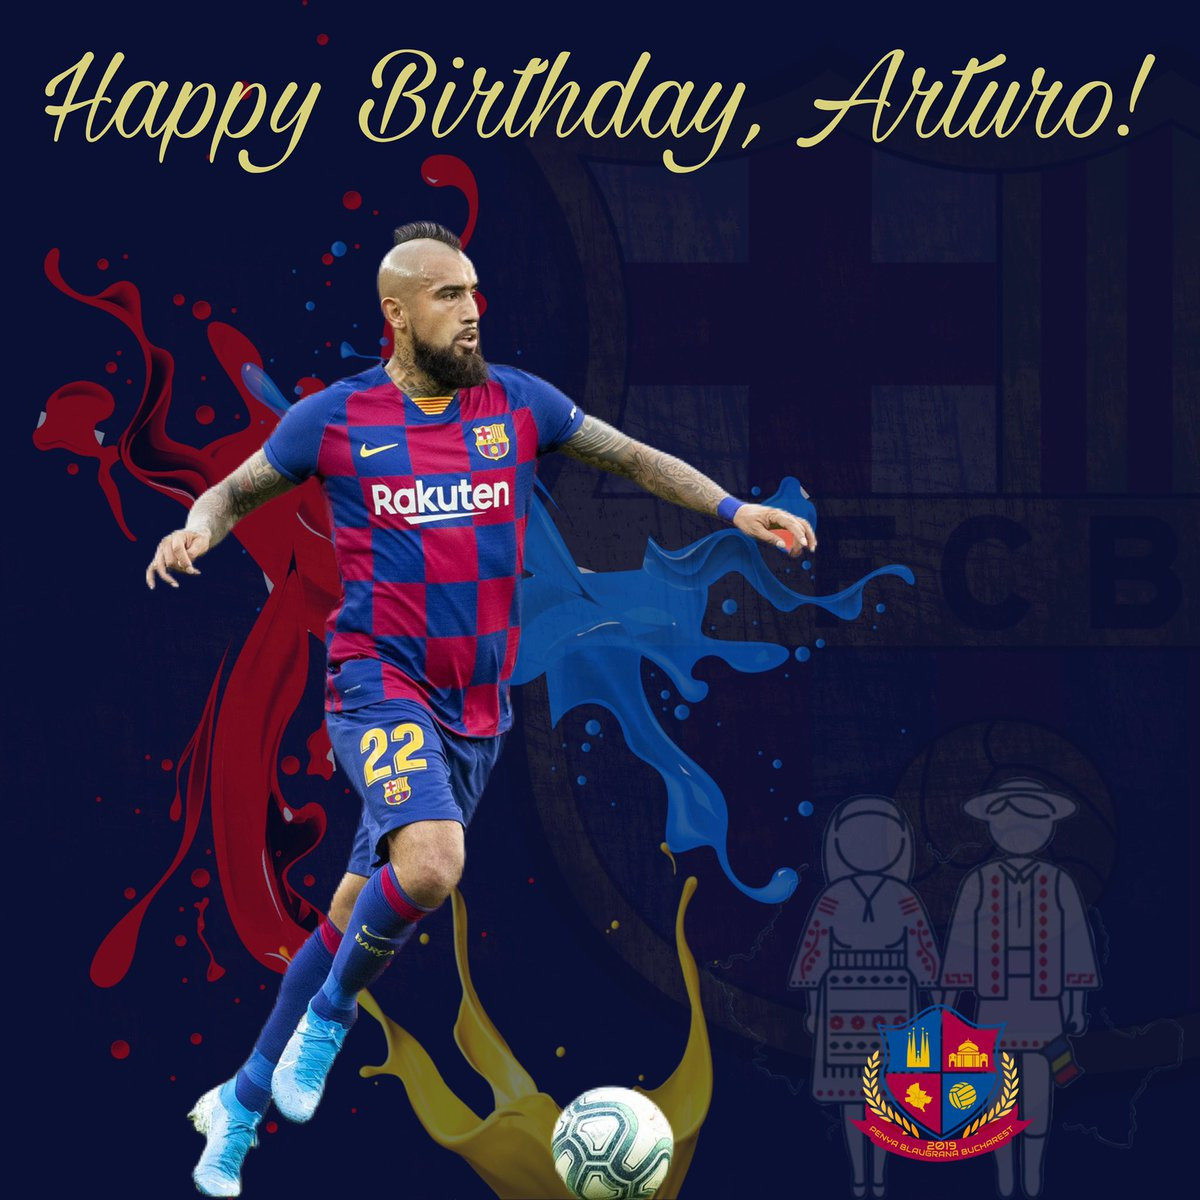 Happy birthday, @kingarturo23oficial   ¡Feliz cumpleaños!  Per molt anys! La Multi Ani! . . . #força #viscaelbarça #fcbarcelona #forçabarça #forçabarça #blaugrana #barça #fcbarcelonafans #cule #cules #barçafans #culé #culés #penya #penyabucharest #happybirthdaypic.twitter.com/ujqEnxPQIi